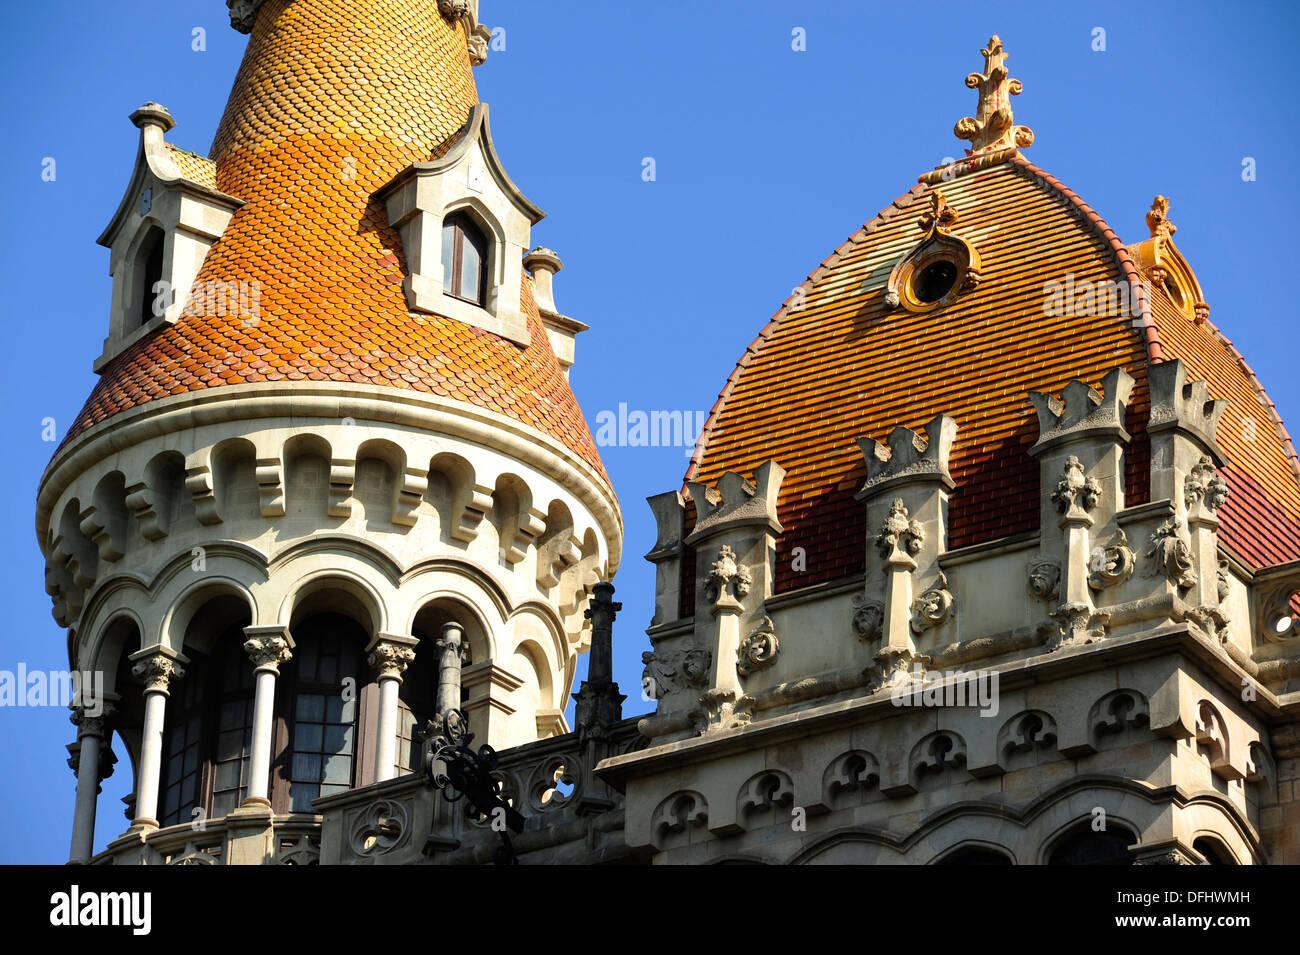 Casos Rocamora, Bonaventura Bassegoda i Amigó / Joaquim Bassegoda i Amigó, estilo historicista, Barcelona, Cataluña, España Imagen De Stock